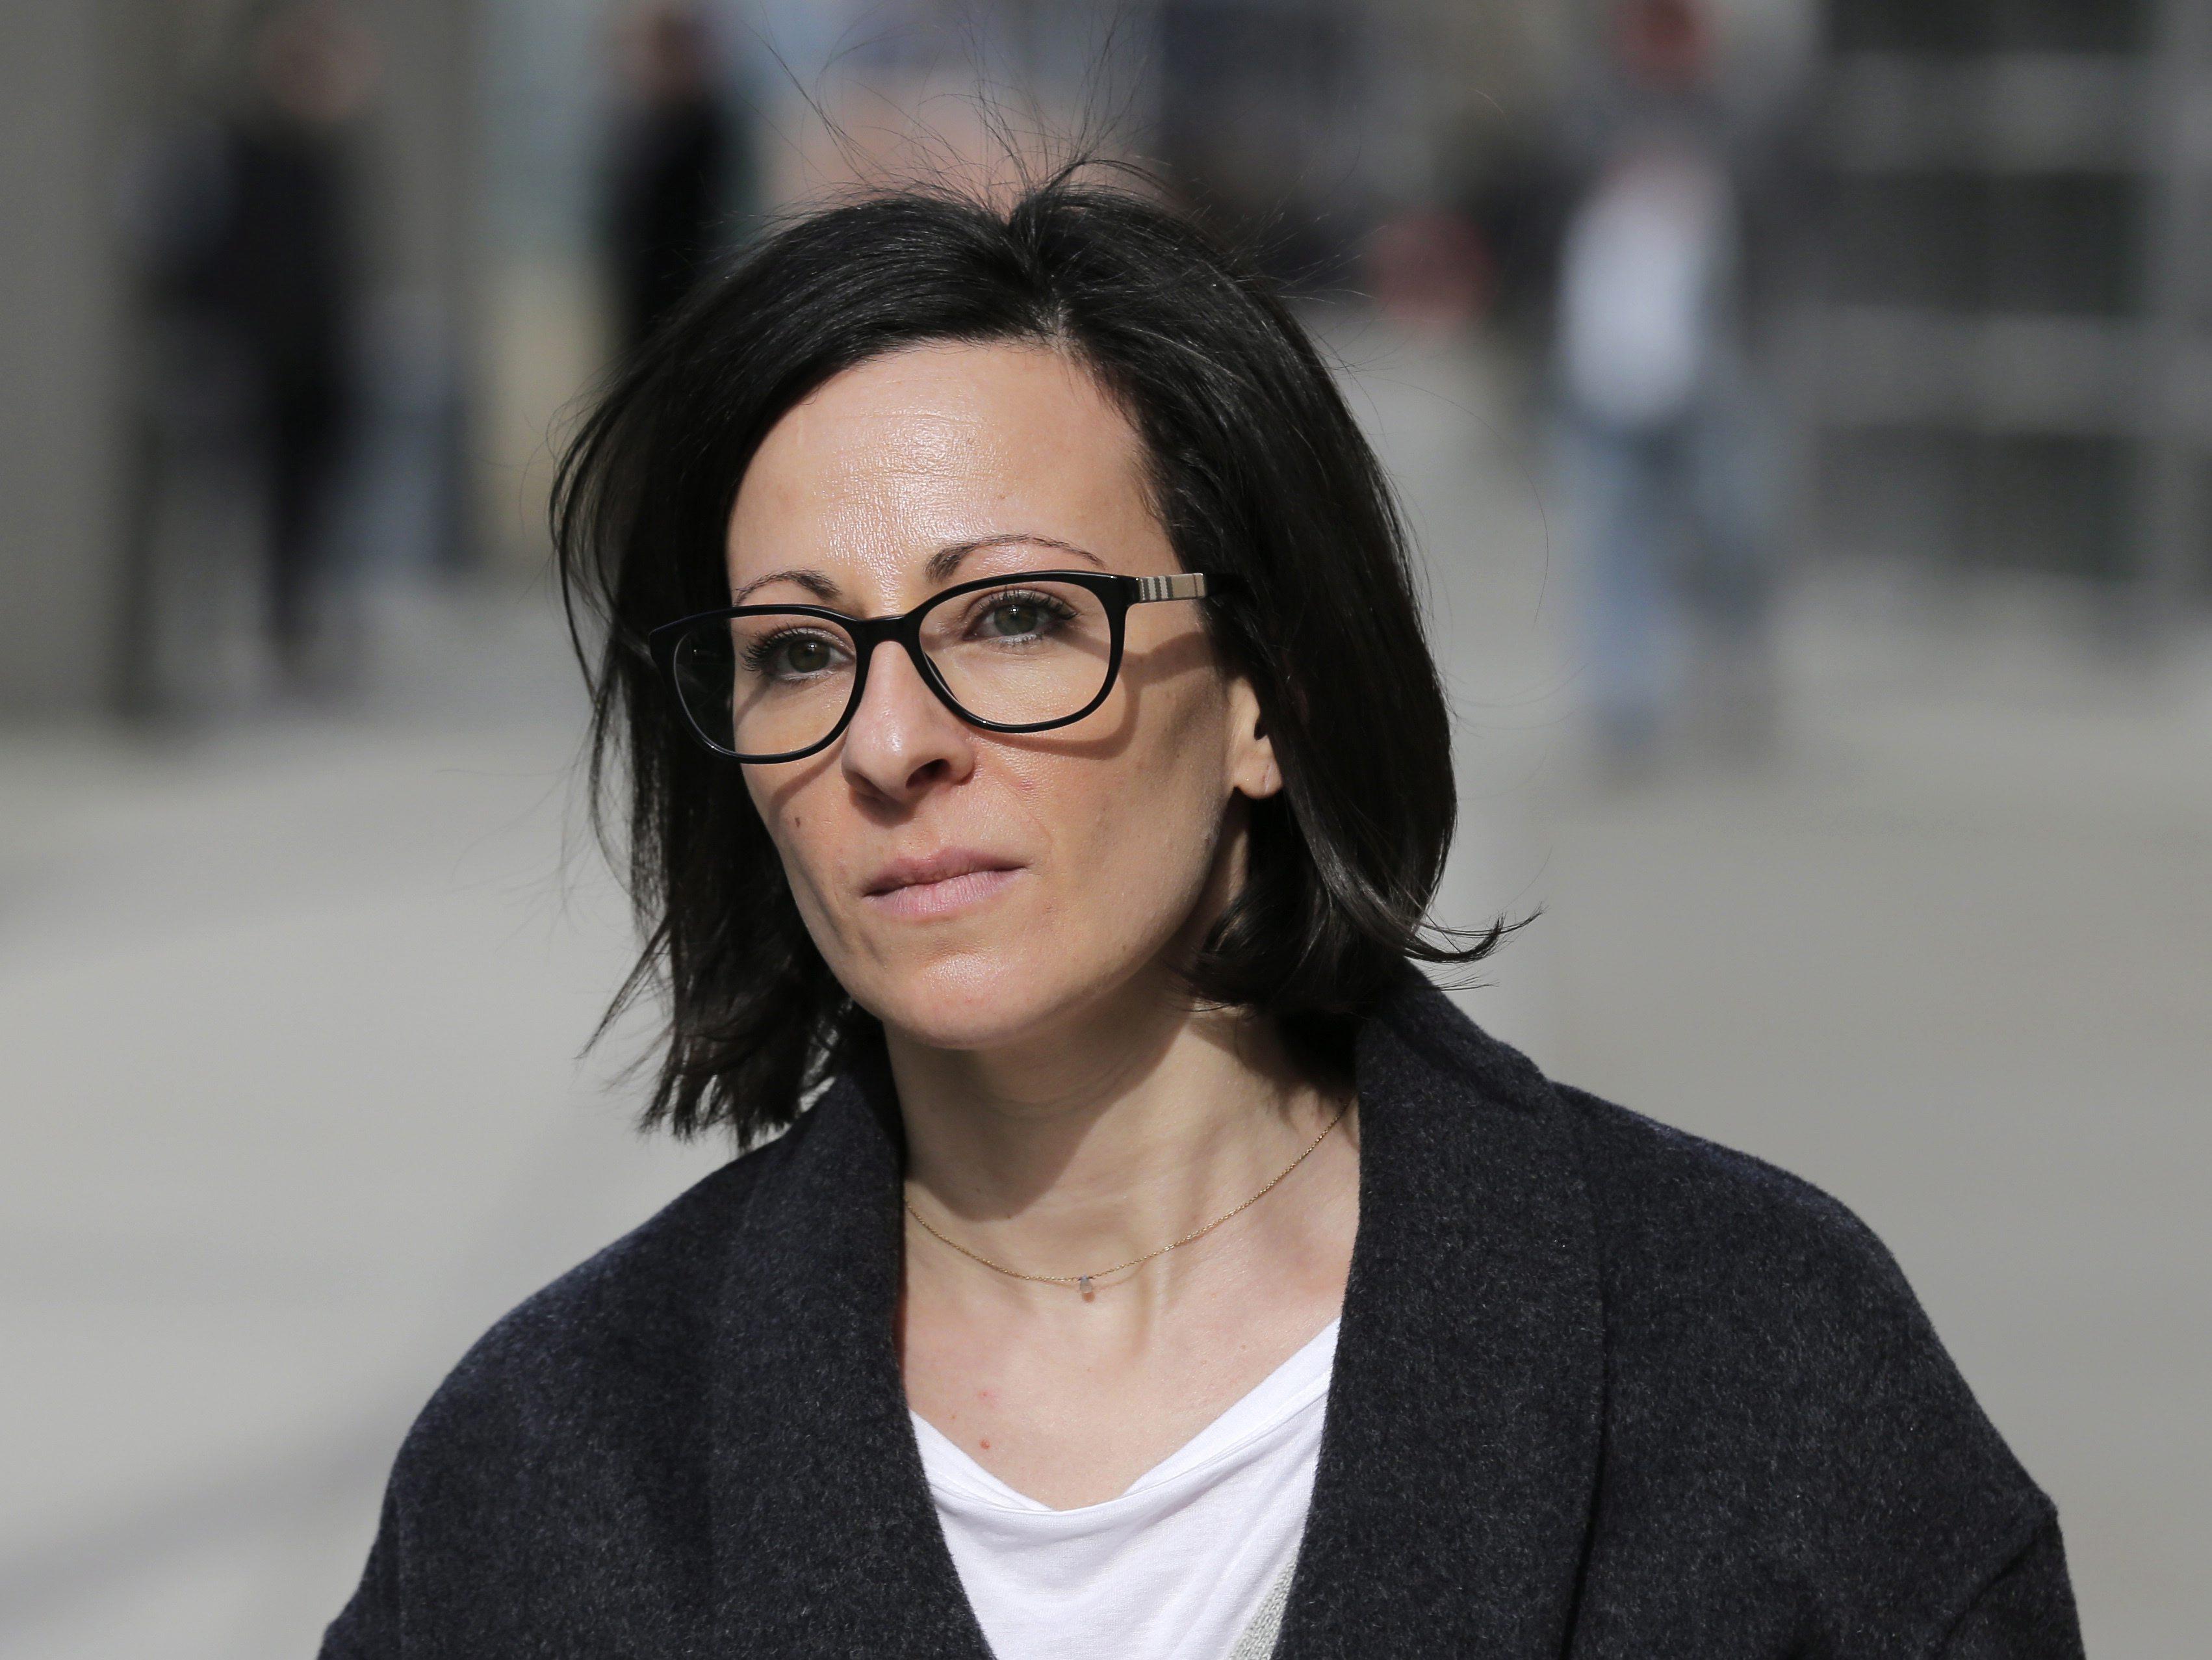 NXIVM sex cult member who gave 'credible testimony' against leader avoids prison time